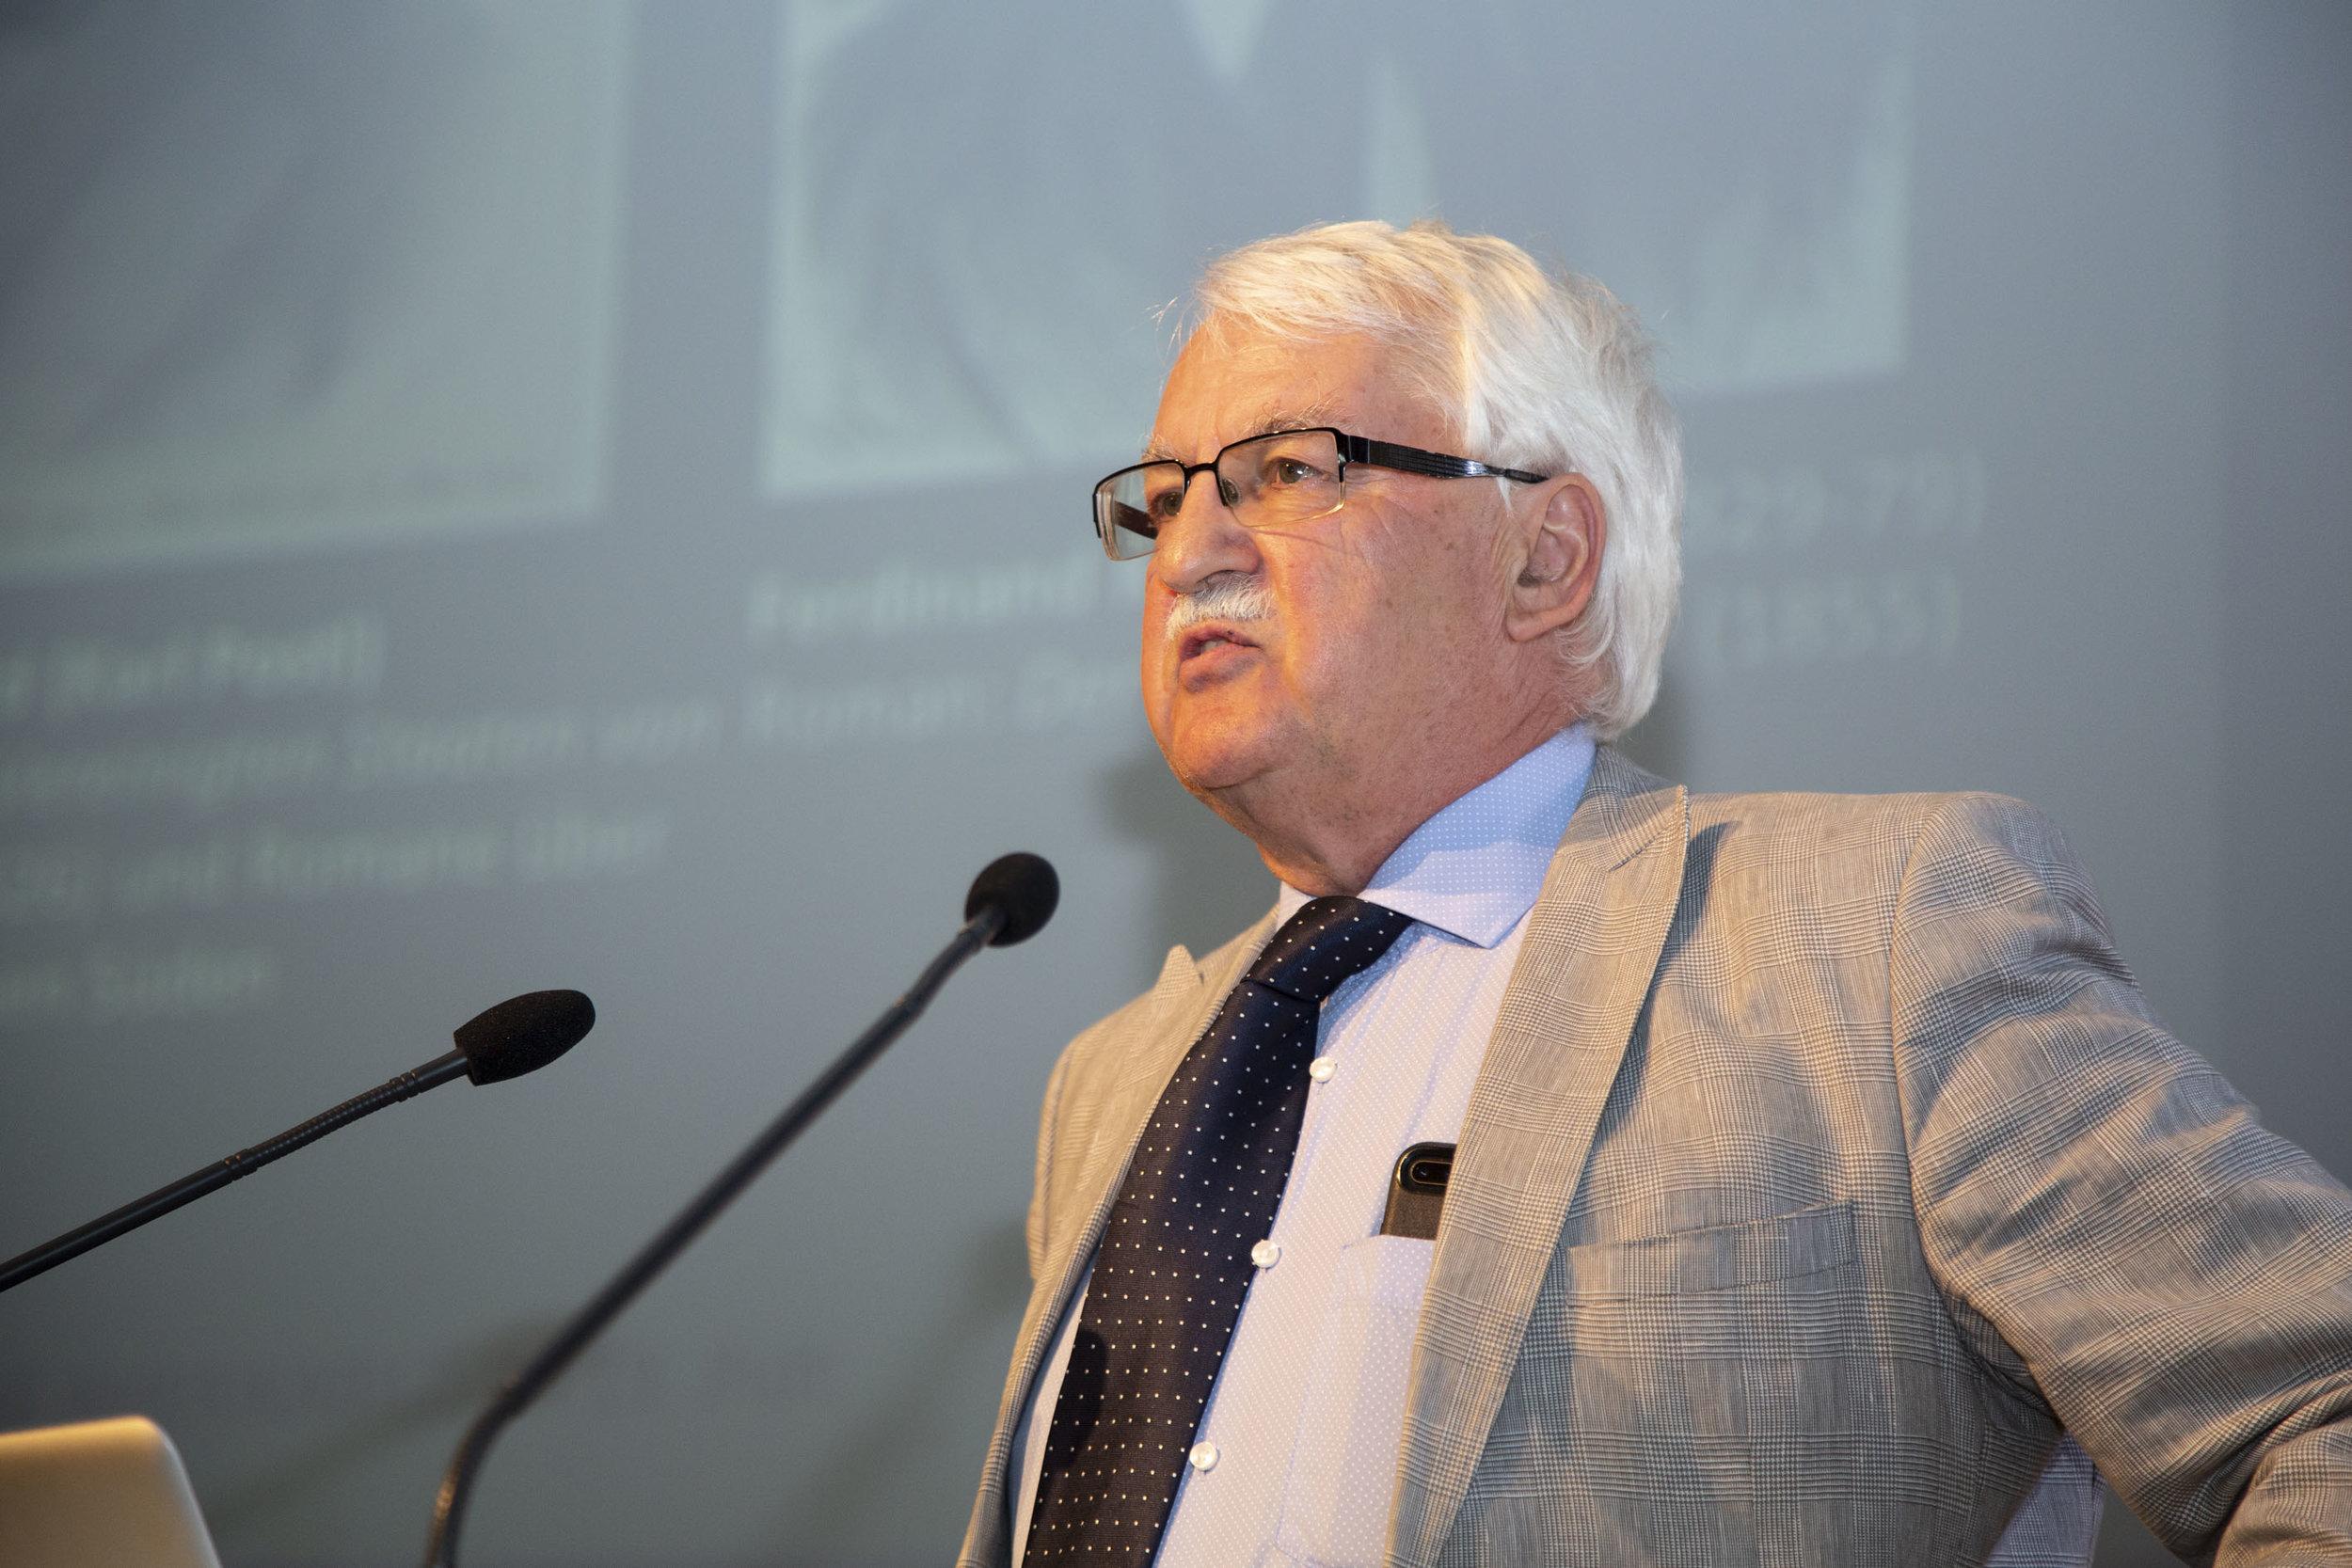 Professor Guenter Bischof,  Director, Austrian Marshall Plan Center for European Studies, The University of New Orleans